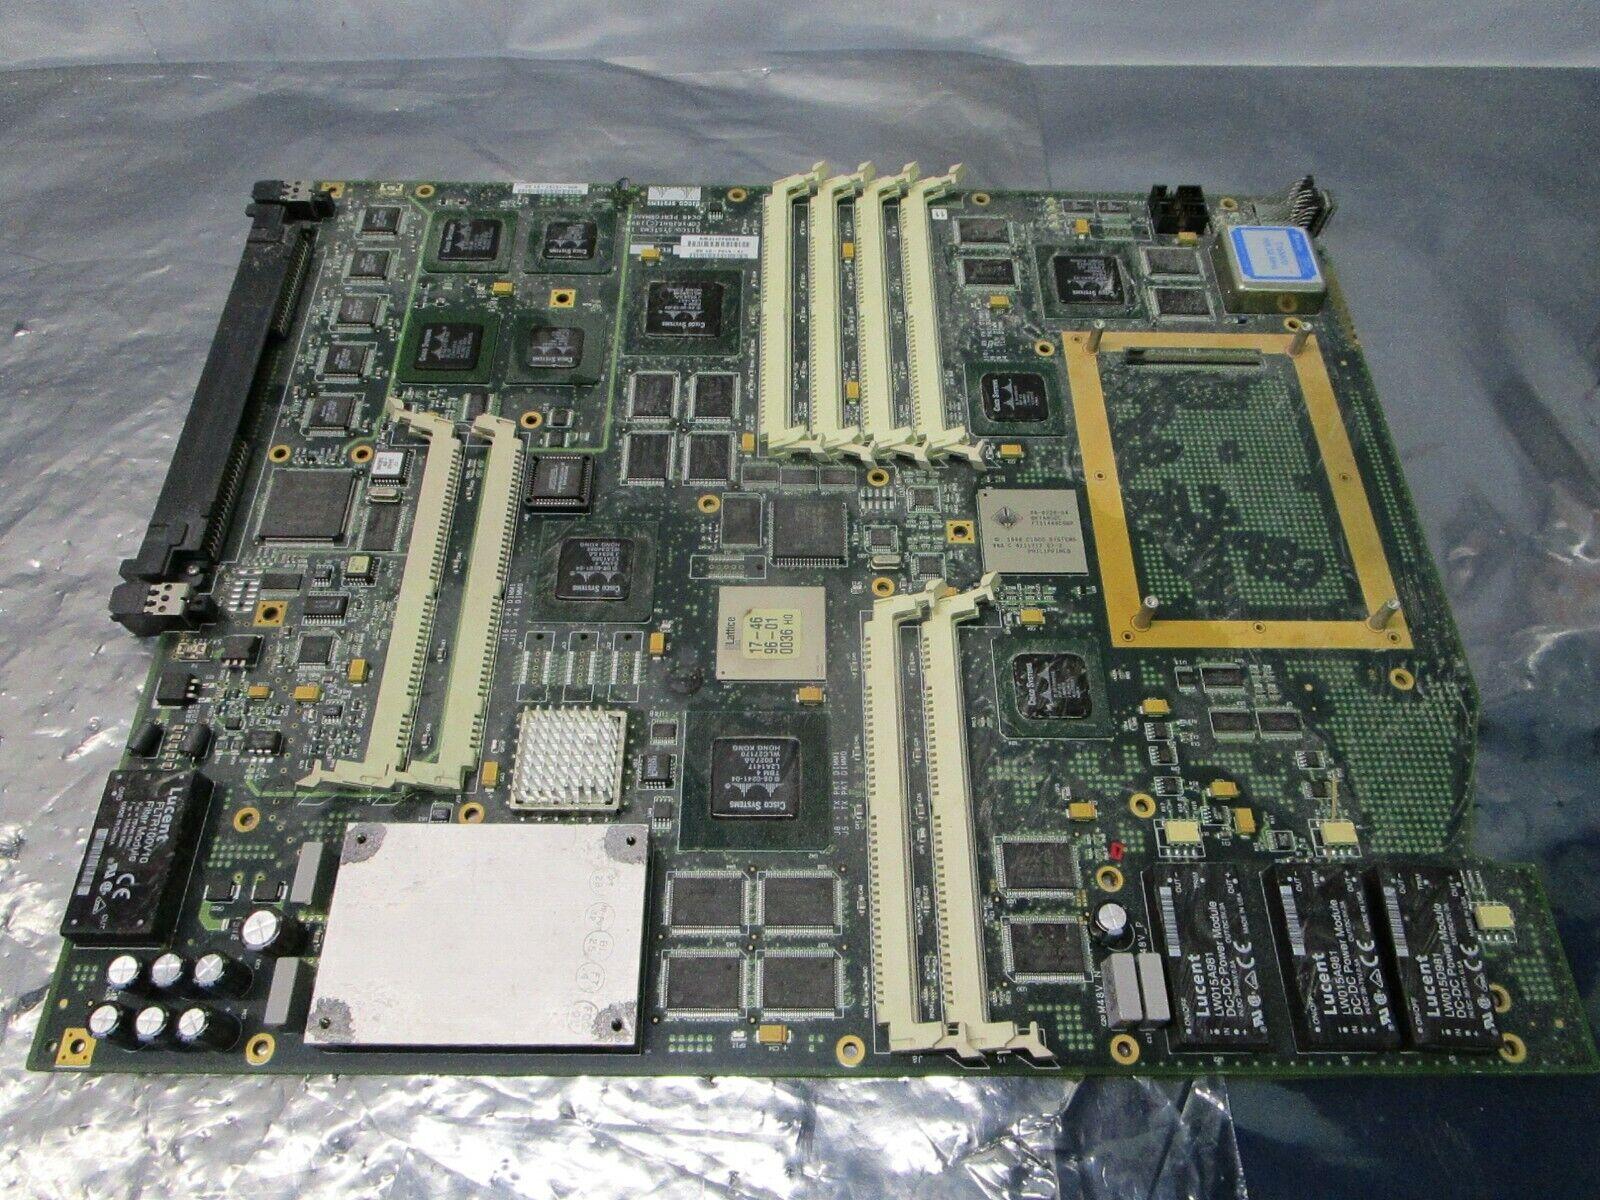 Cisco 800-12137-01 Main Board Motherboard, 73-6104-01, 101347